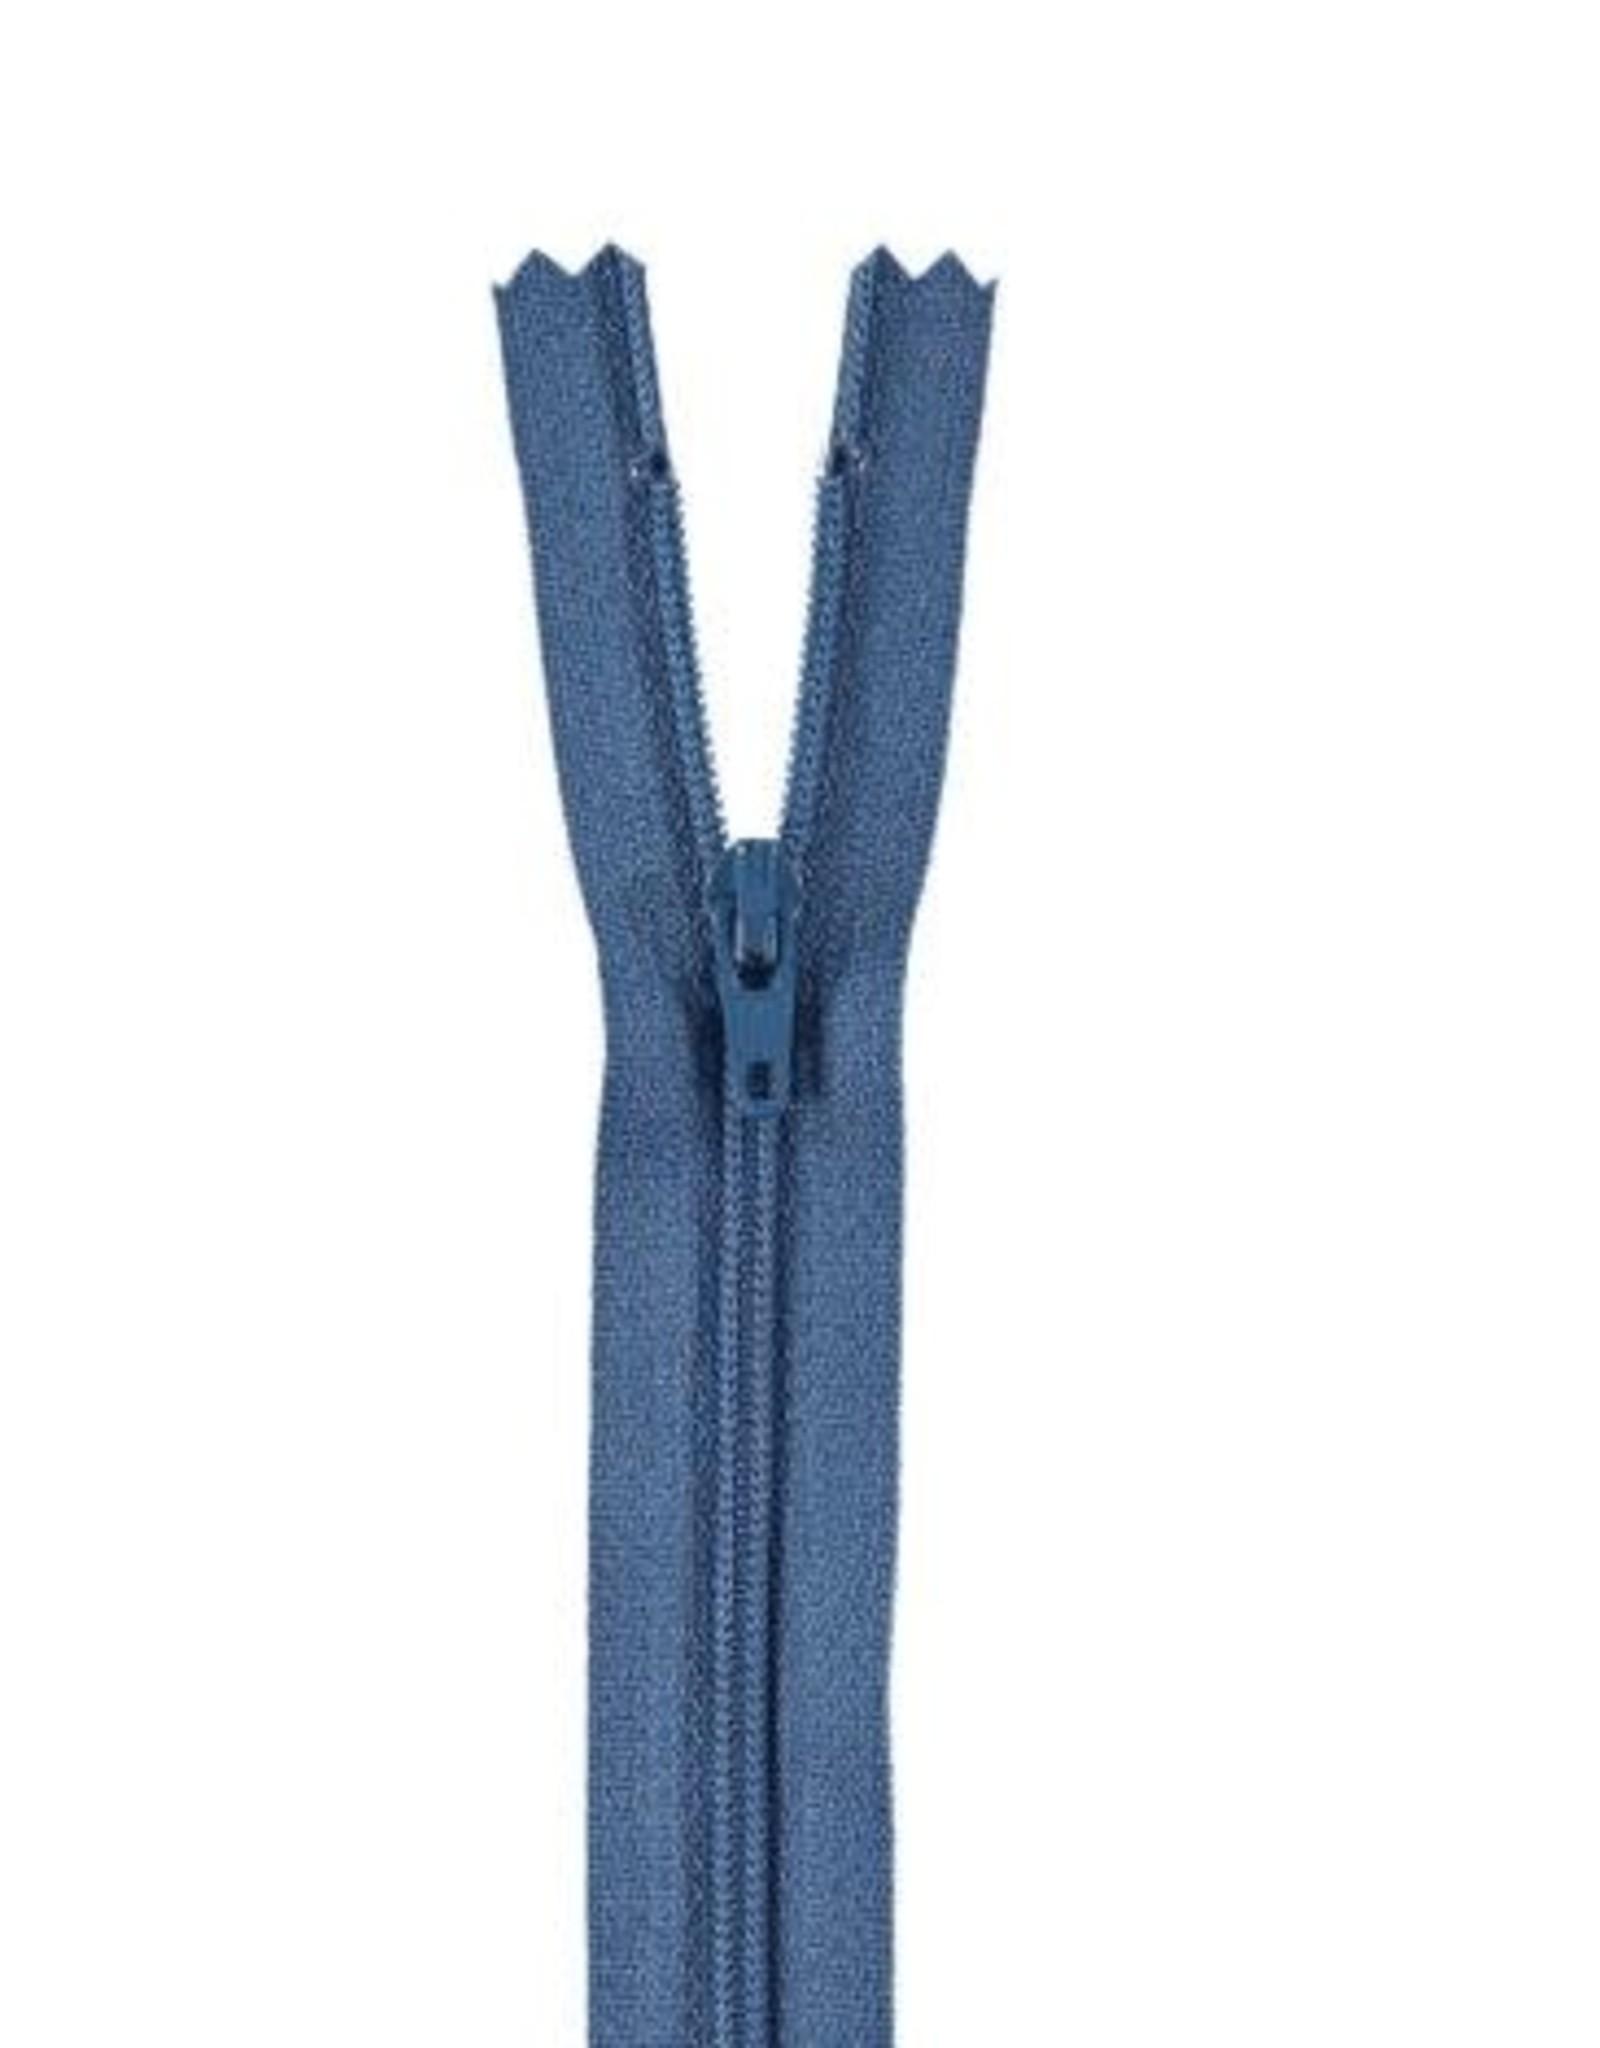 YKK Spiraalrits niet-DB 3mm jeansblauw 839-20cm